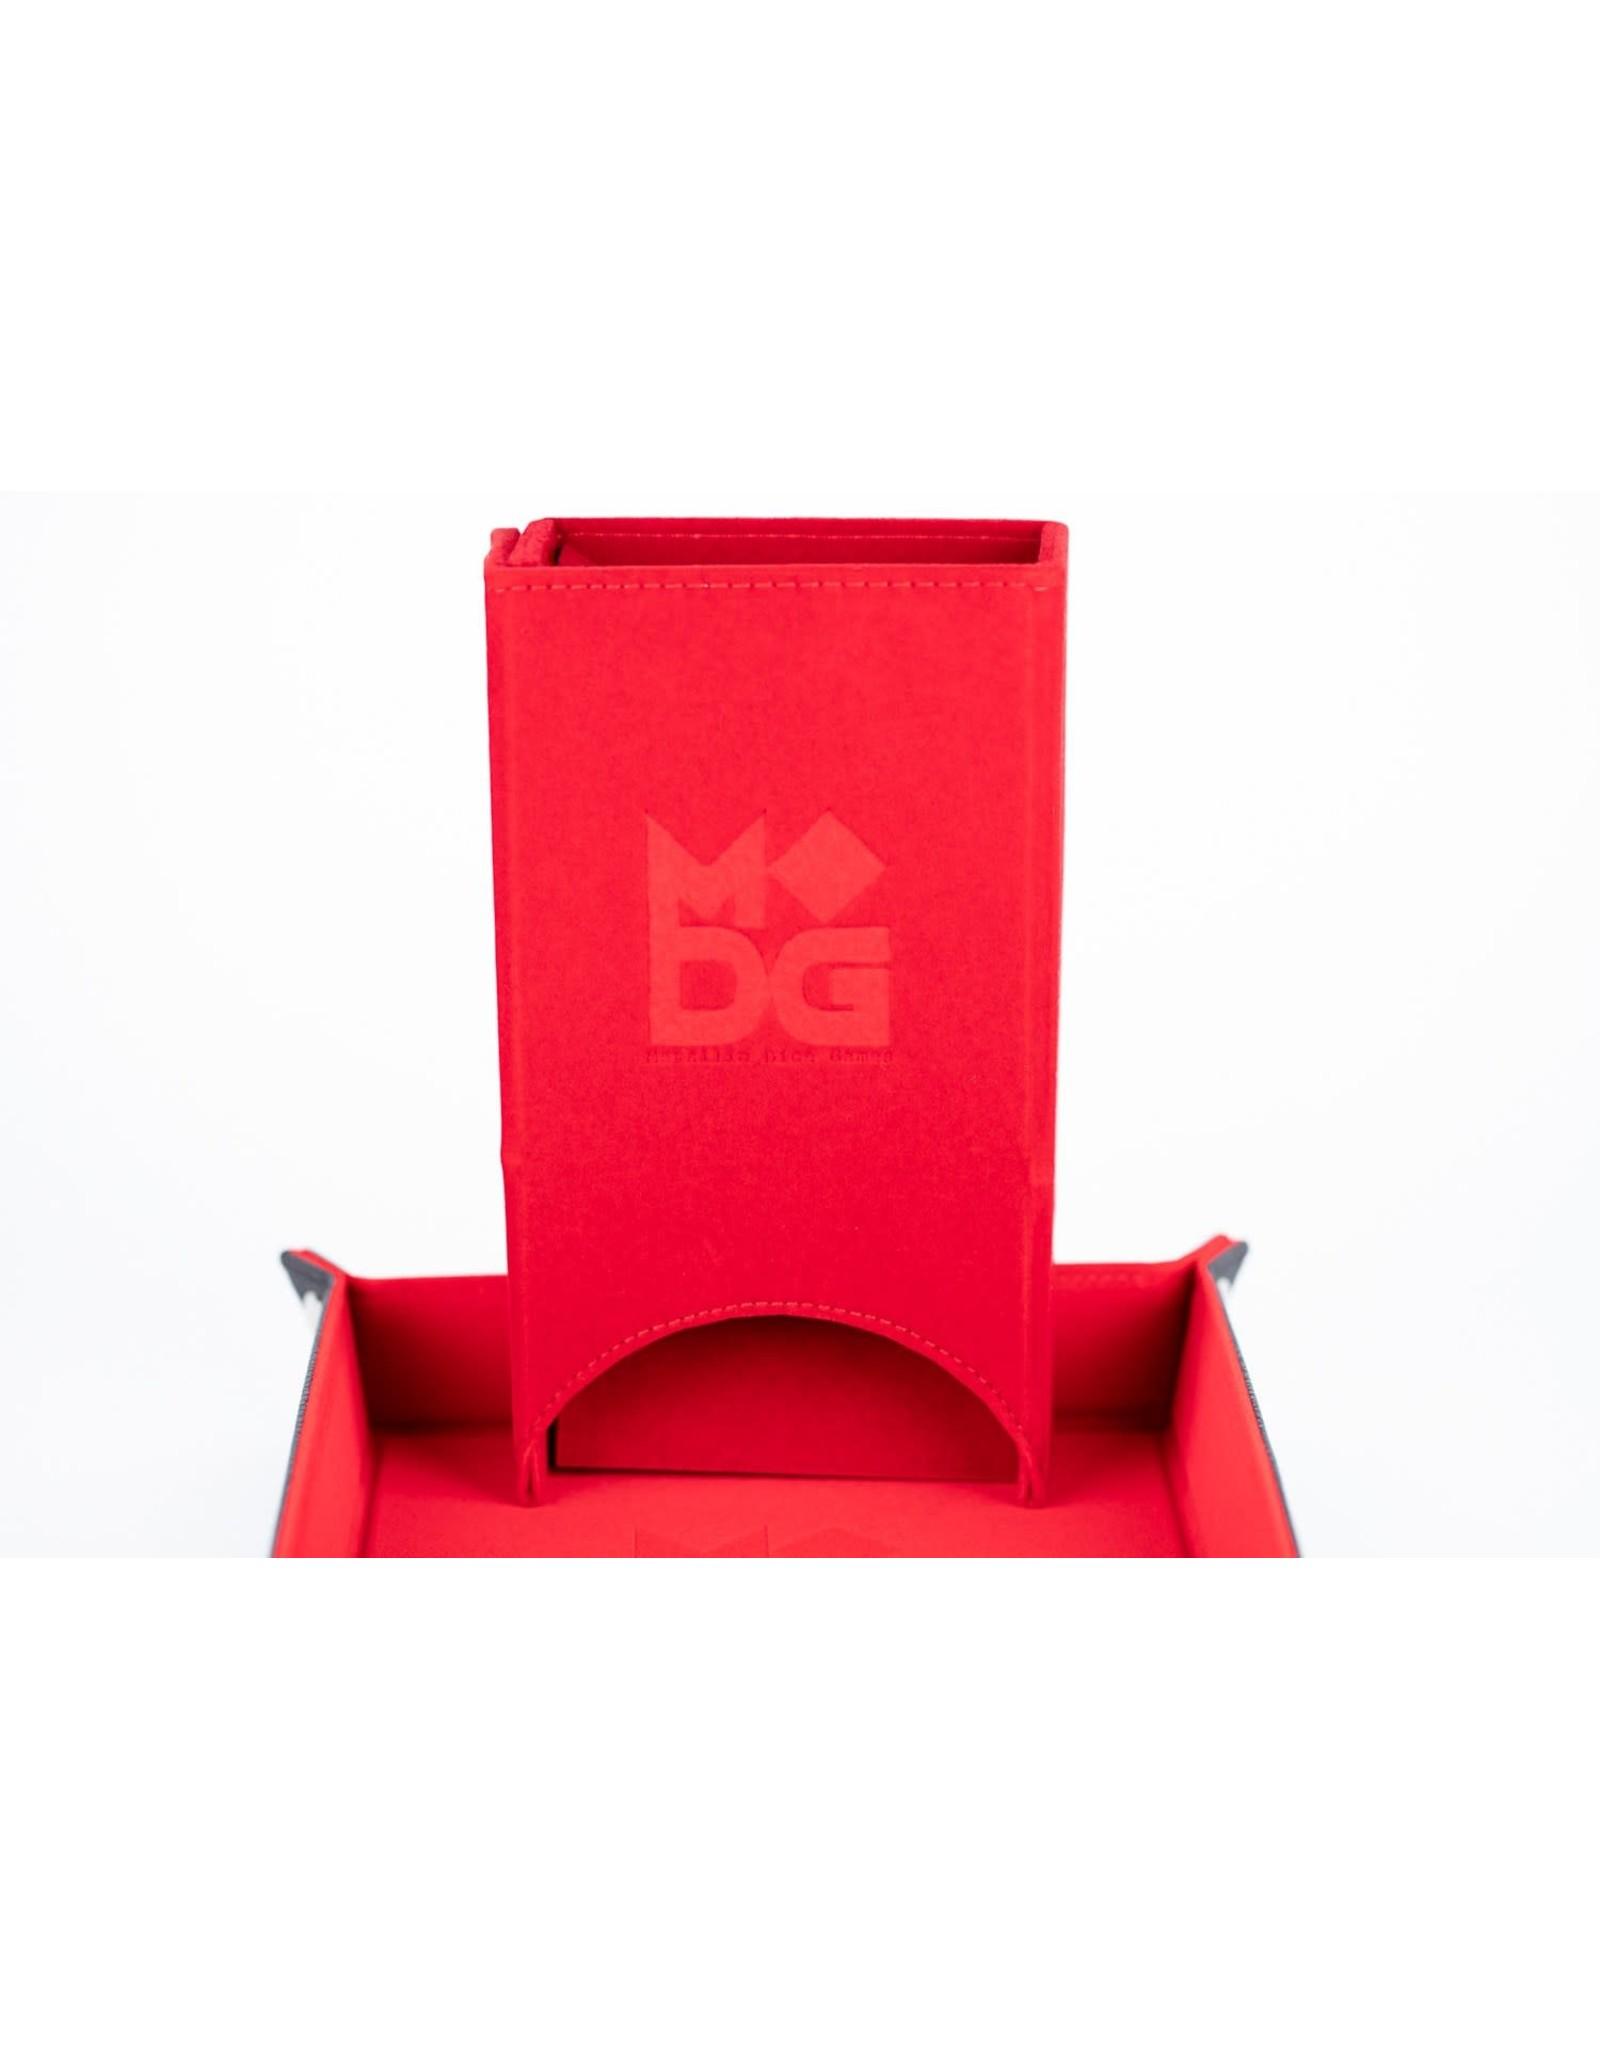 Metallic Dice Games Velvet Folding Dice Tower: Red